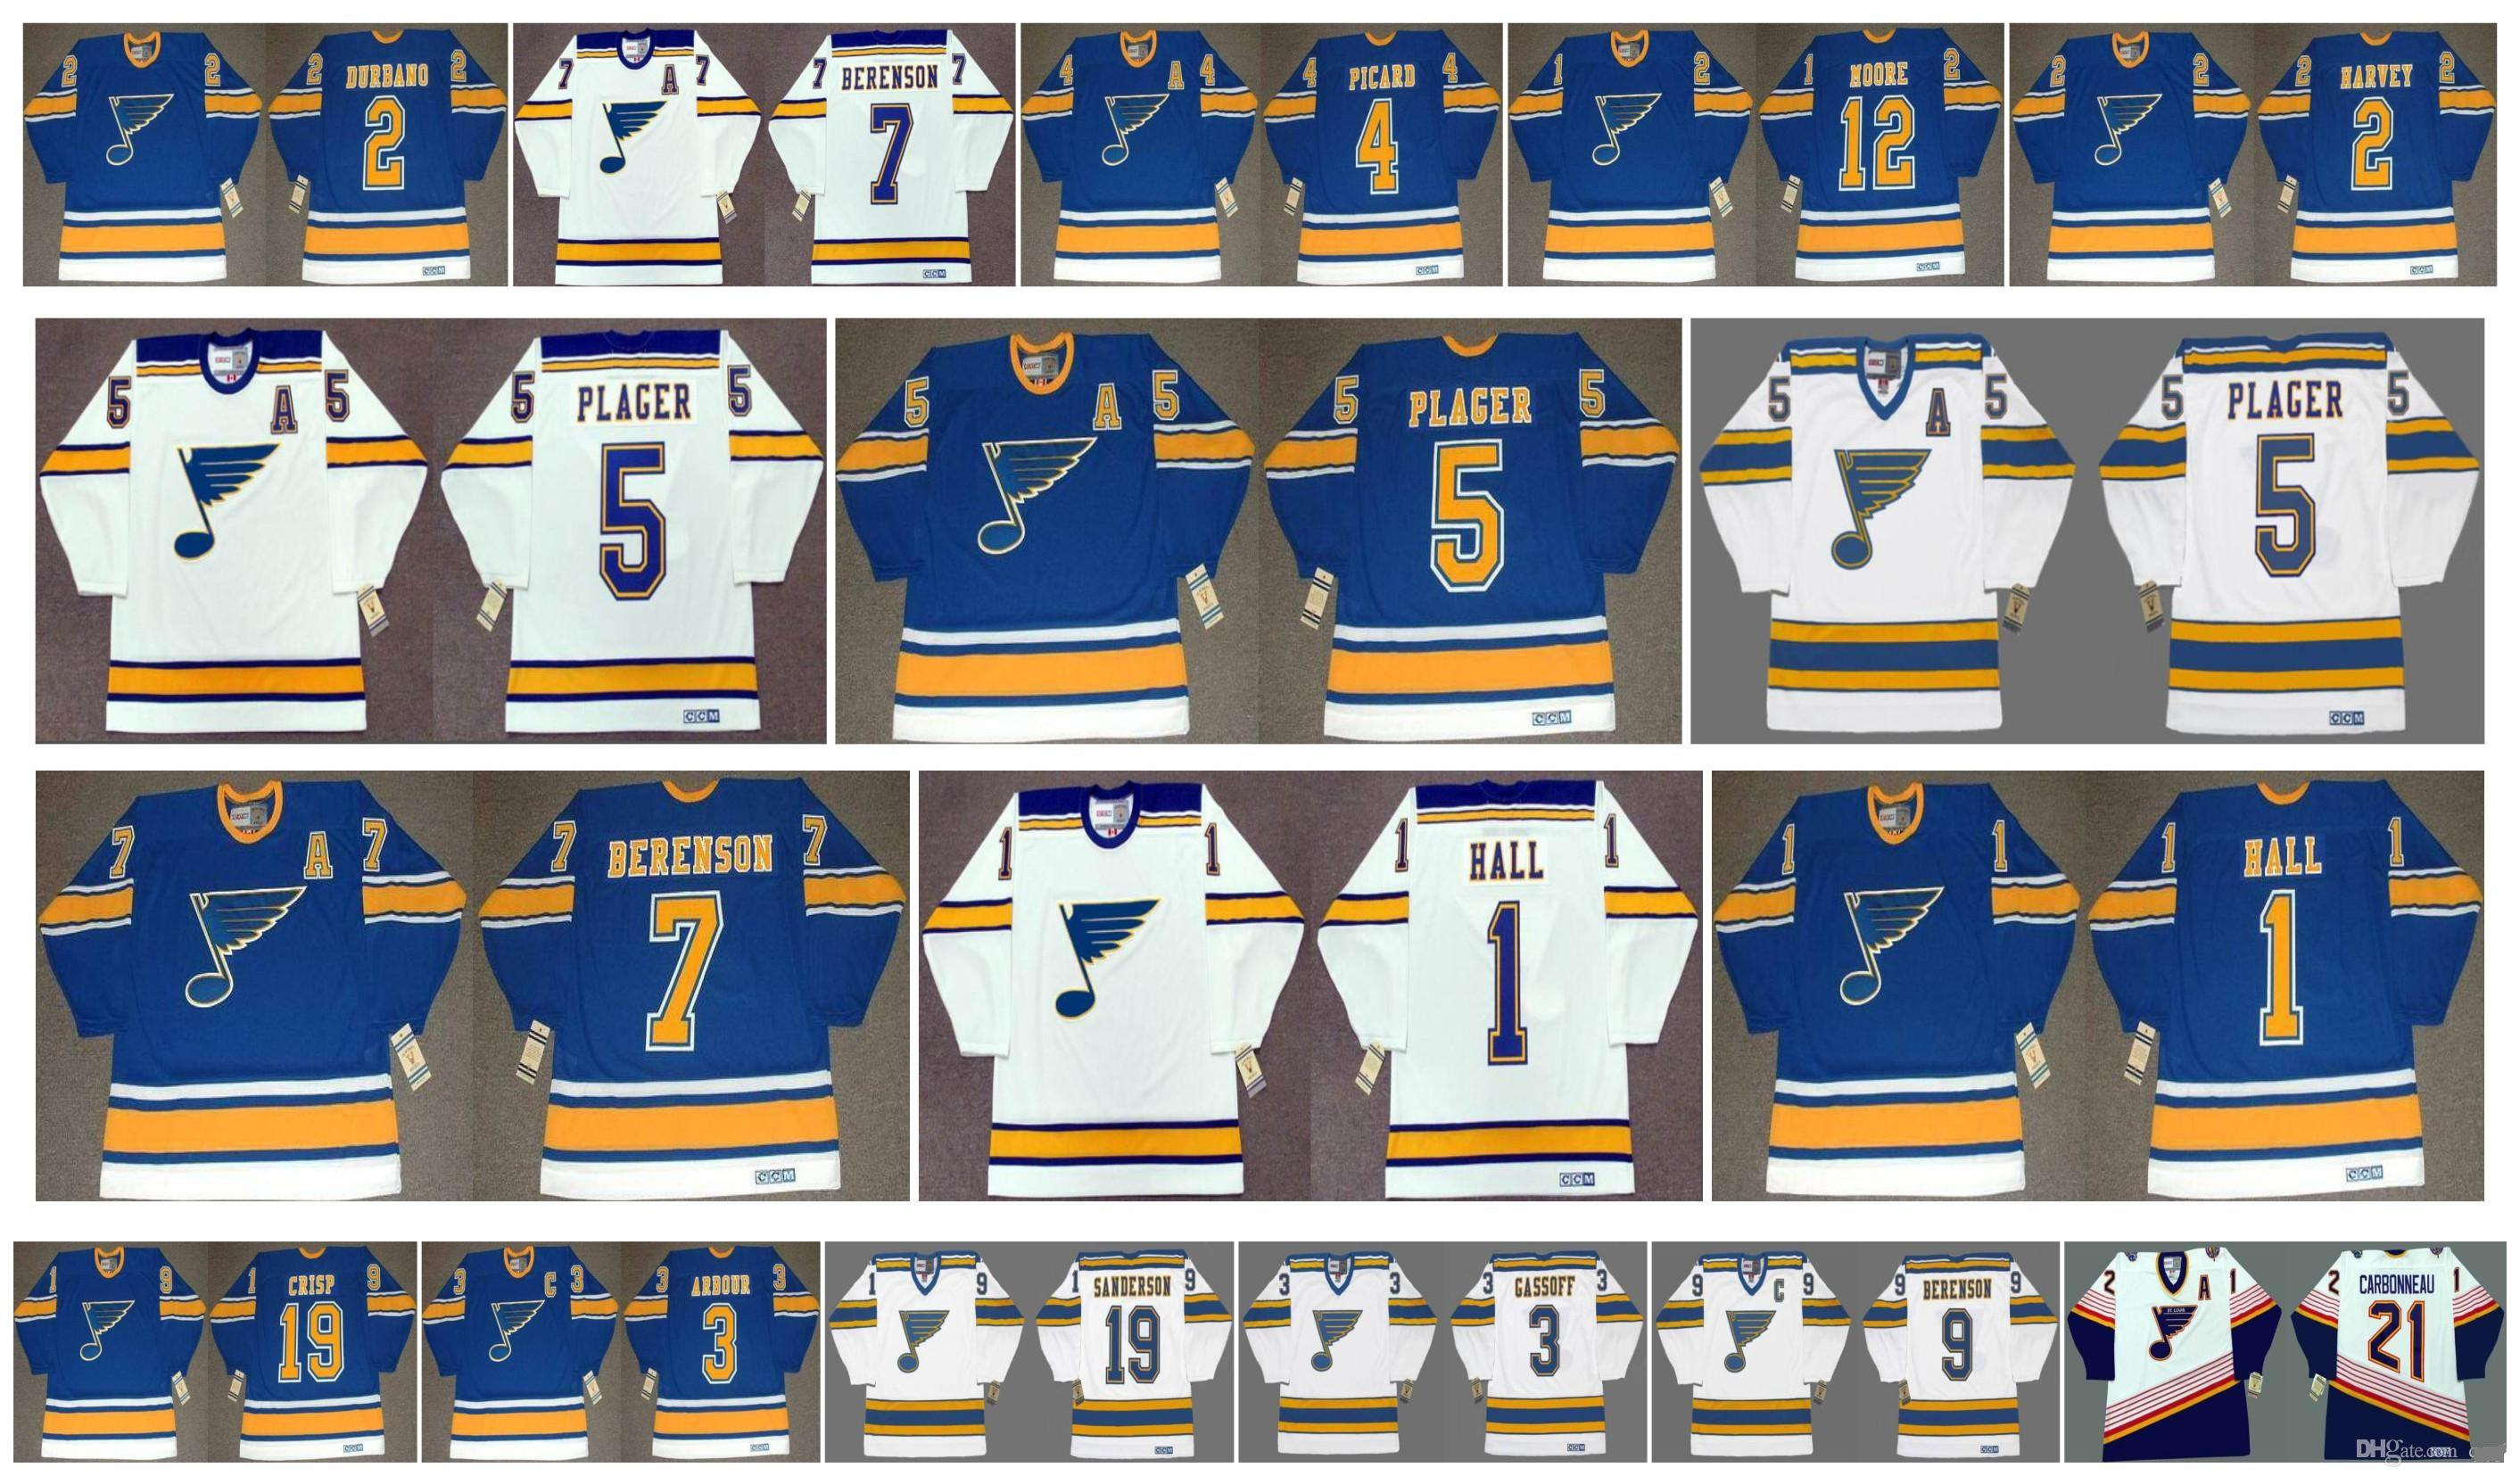 Vintage St. Louis Blues Jerseys 5 Bob Plager 1 Glenn Hall 7 Red Berenson 4 Noel Picard DICKIE MOORE 2 Doug Harvey 2 Steve Durbano CCM Hockey